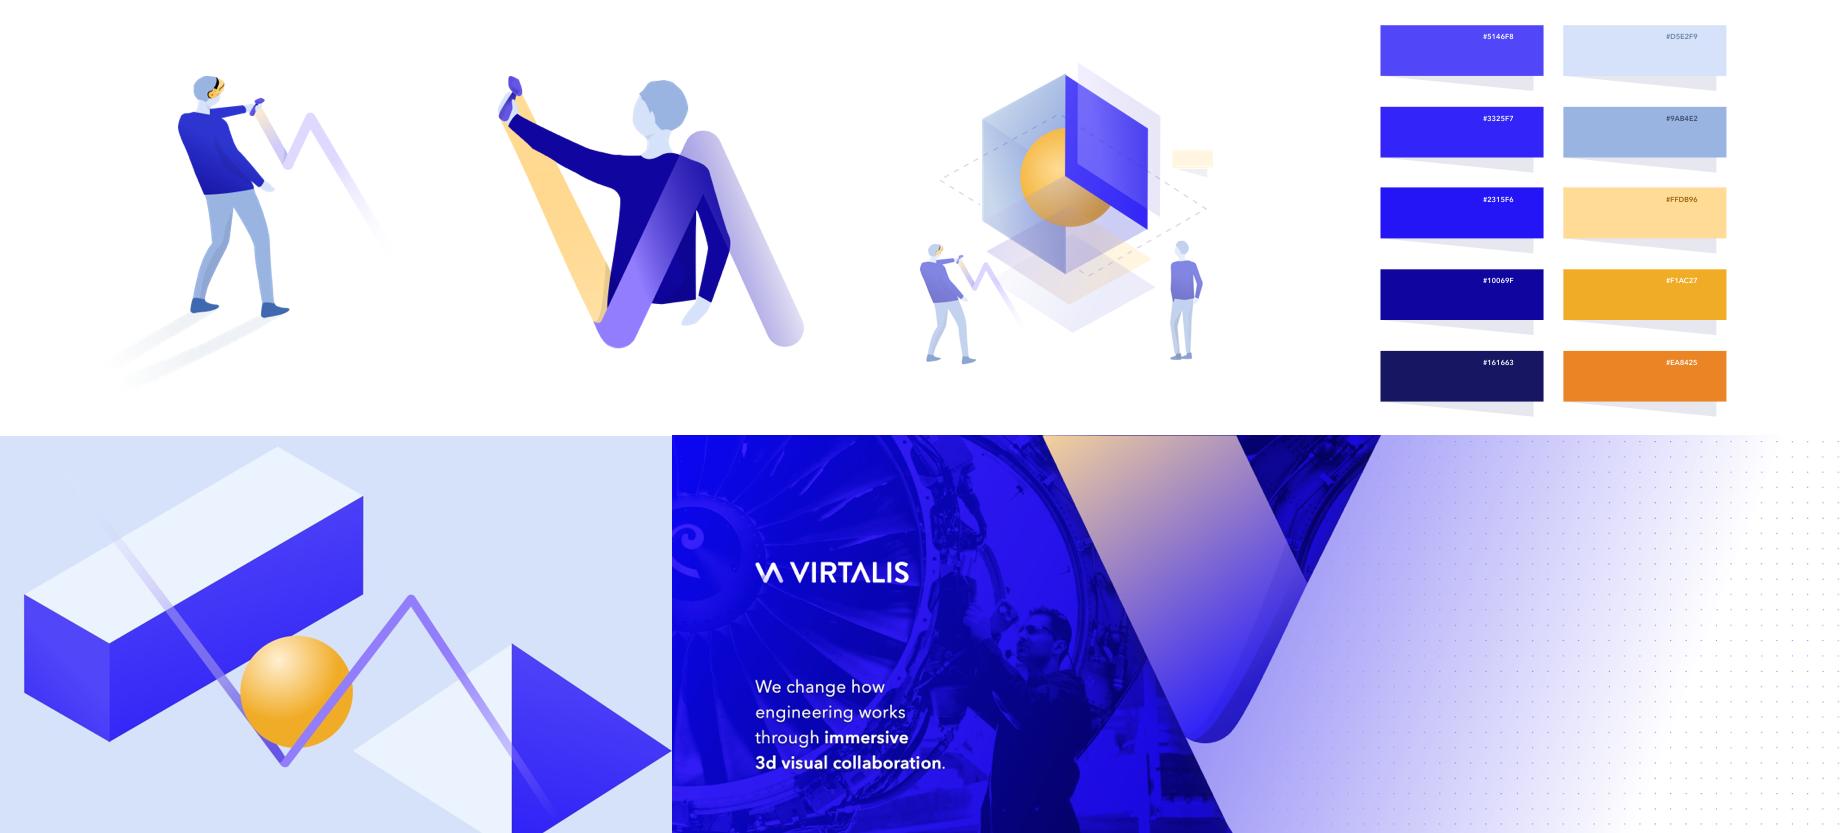 Design snapshots of the Virtalis Branding